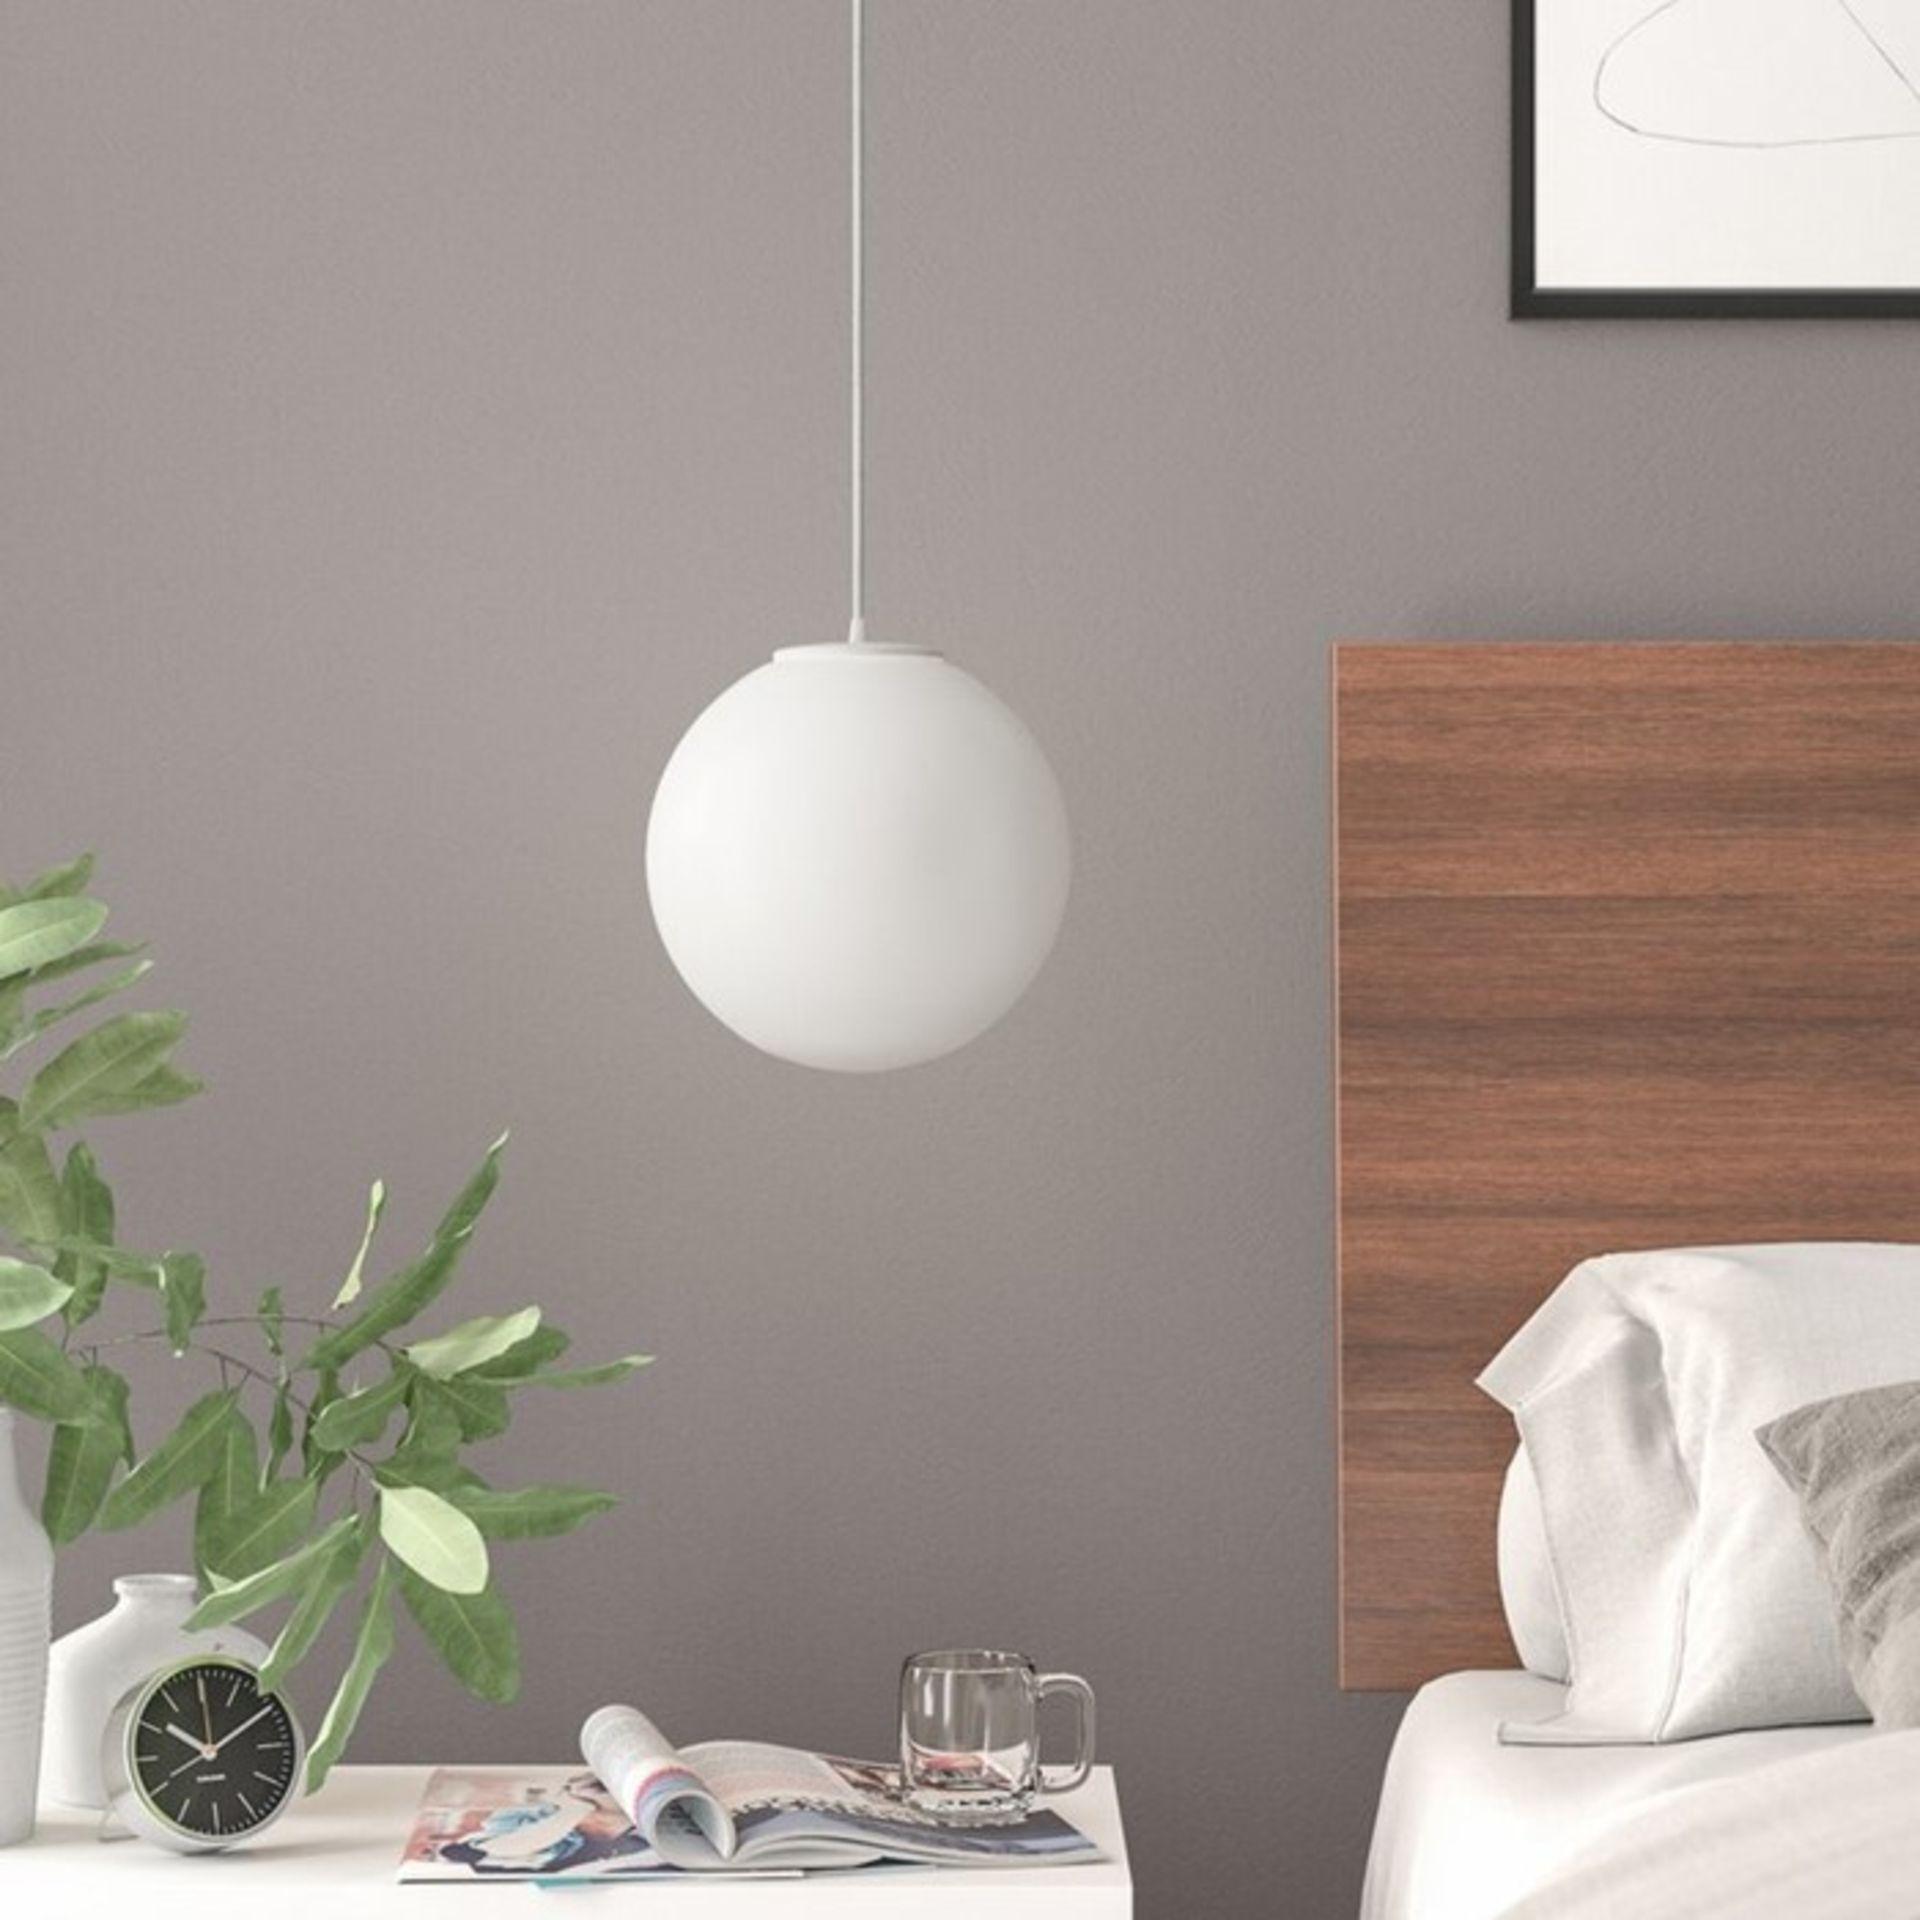 Fjørde & Co, Dennik 1-Light Globe Pendant (BLACK) - RRP £62.82 (SOTT1315 - 12334/15) 6E